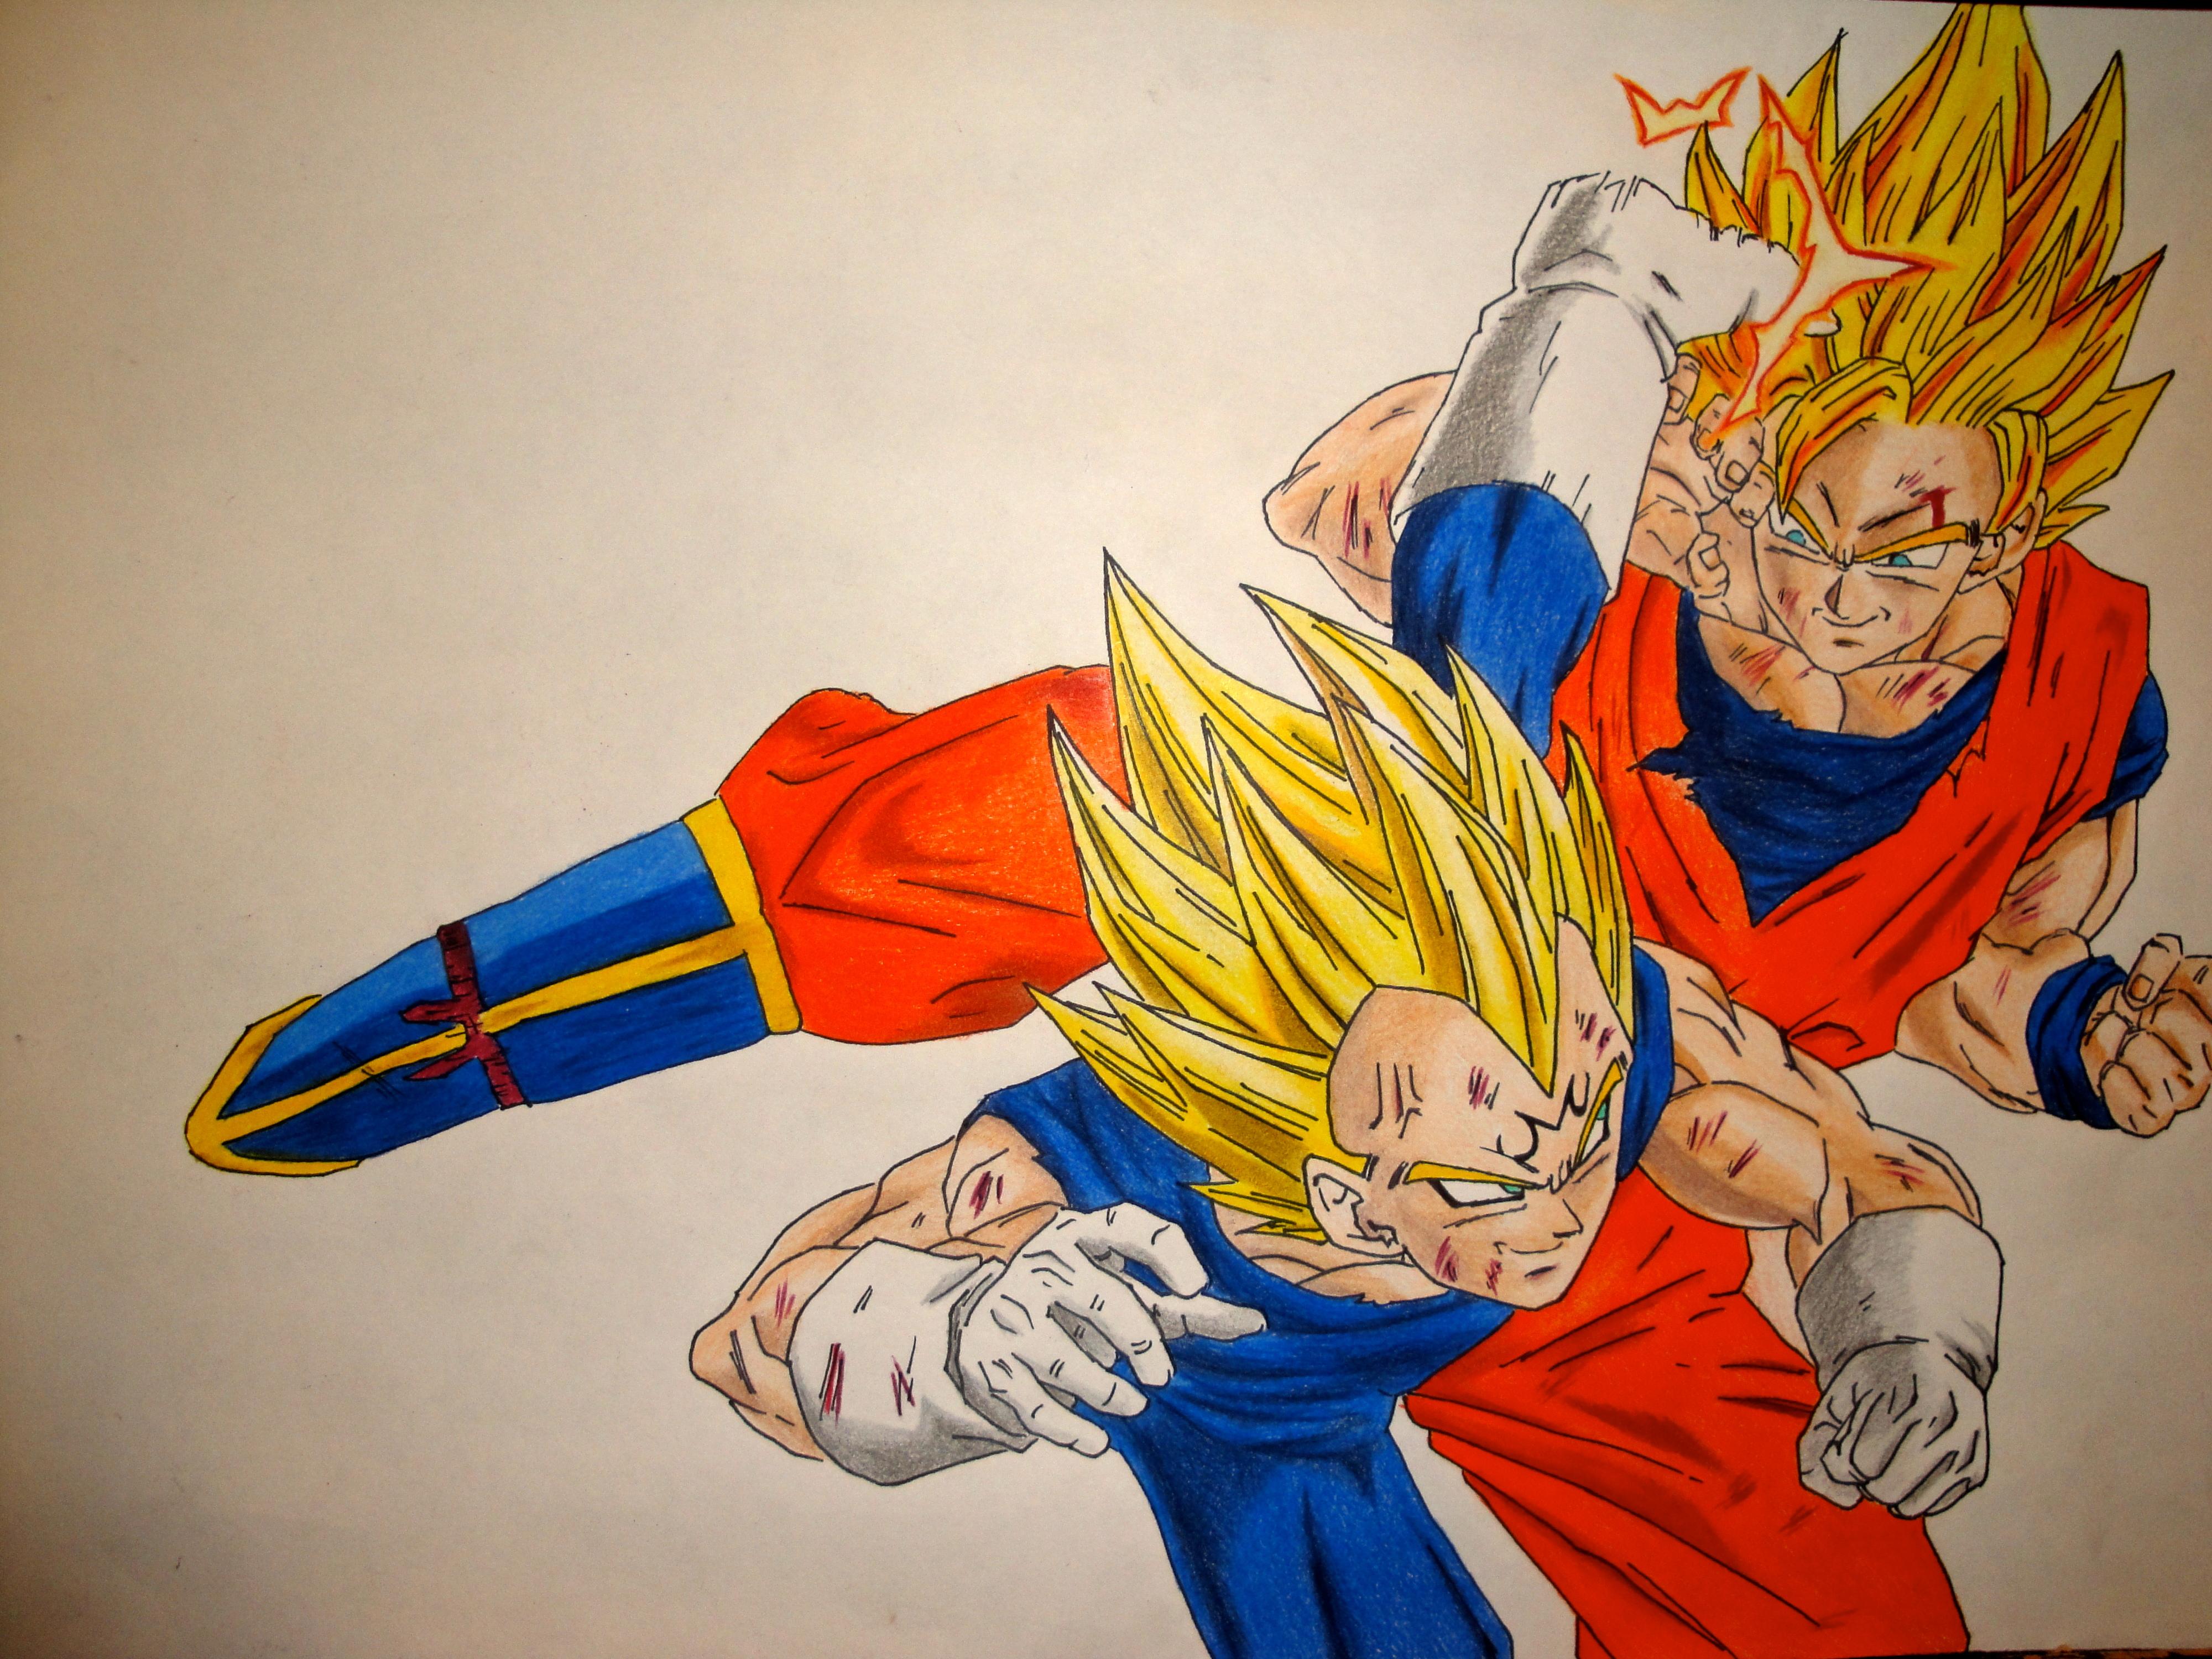 Goku Vs Vegeta   Wallpaper Pin it 4000x3000